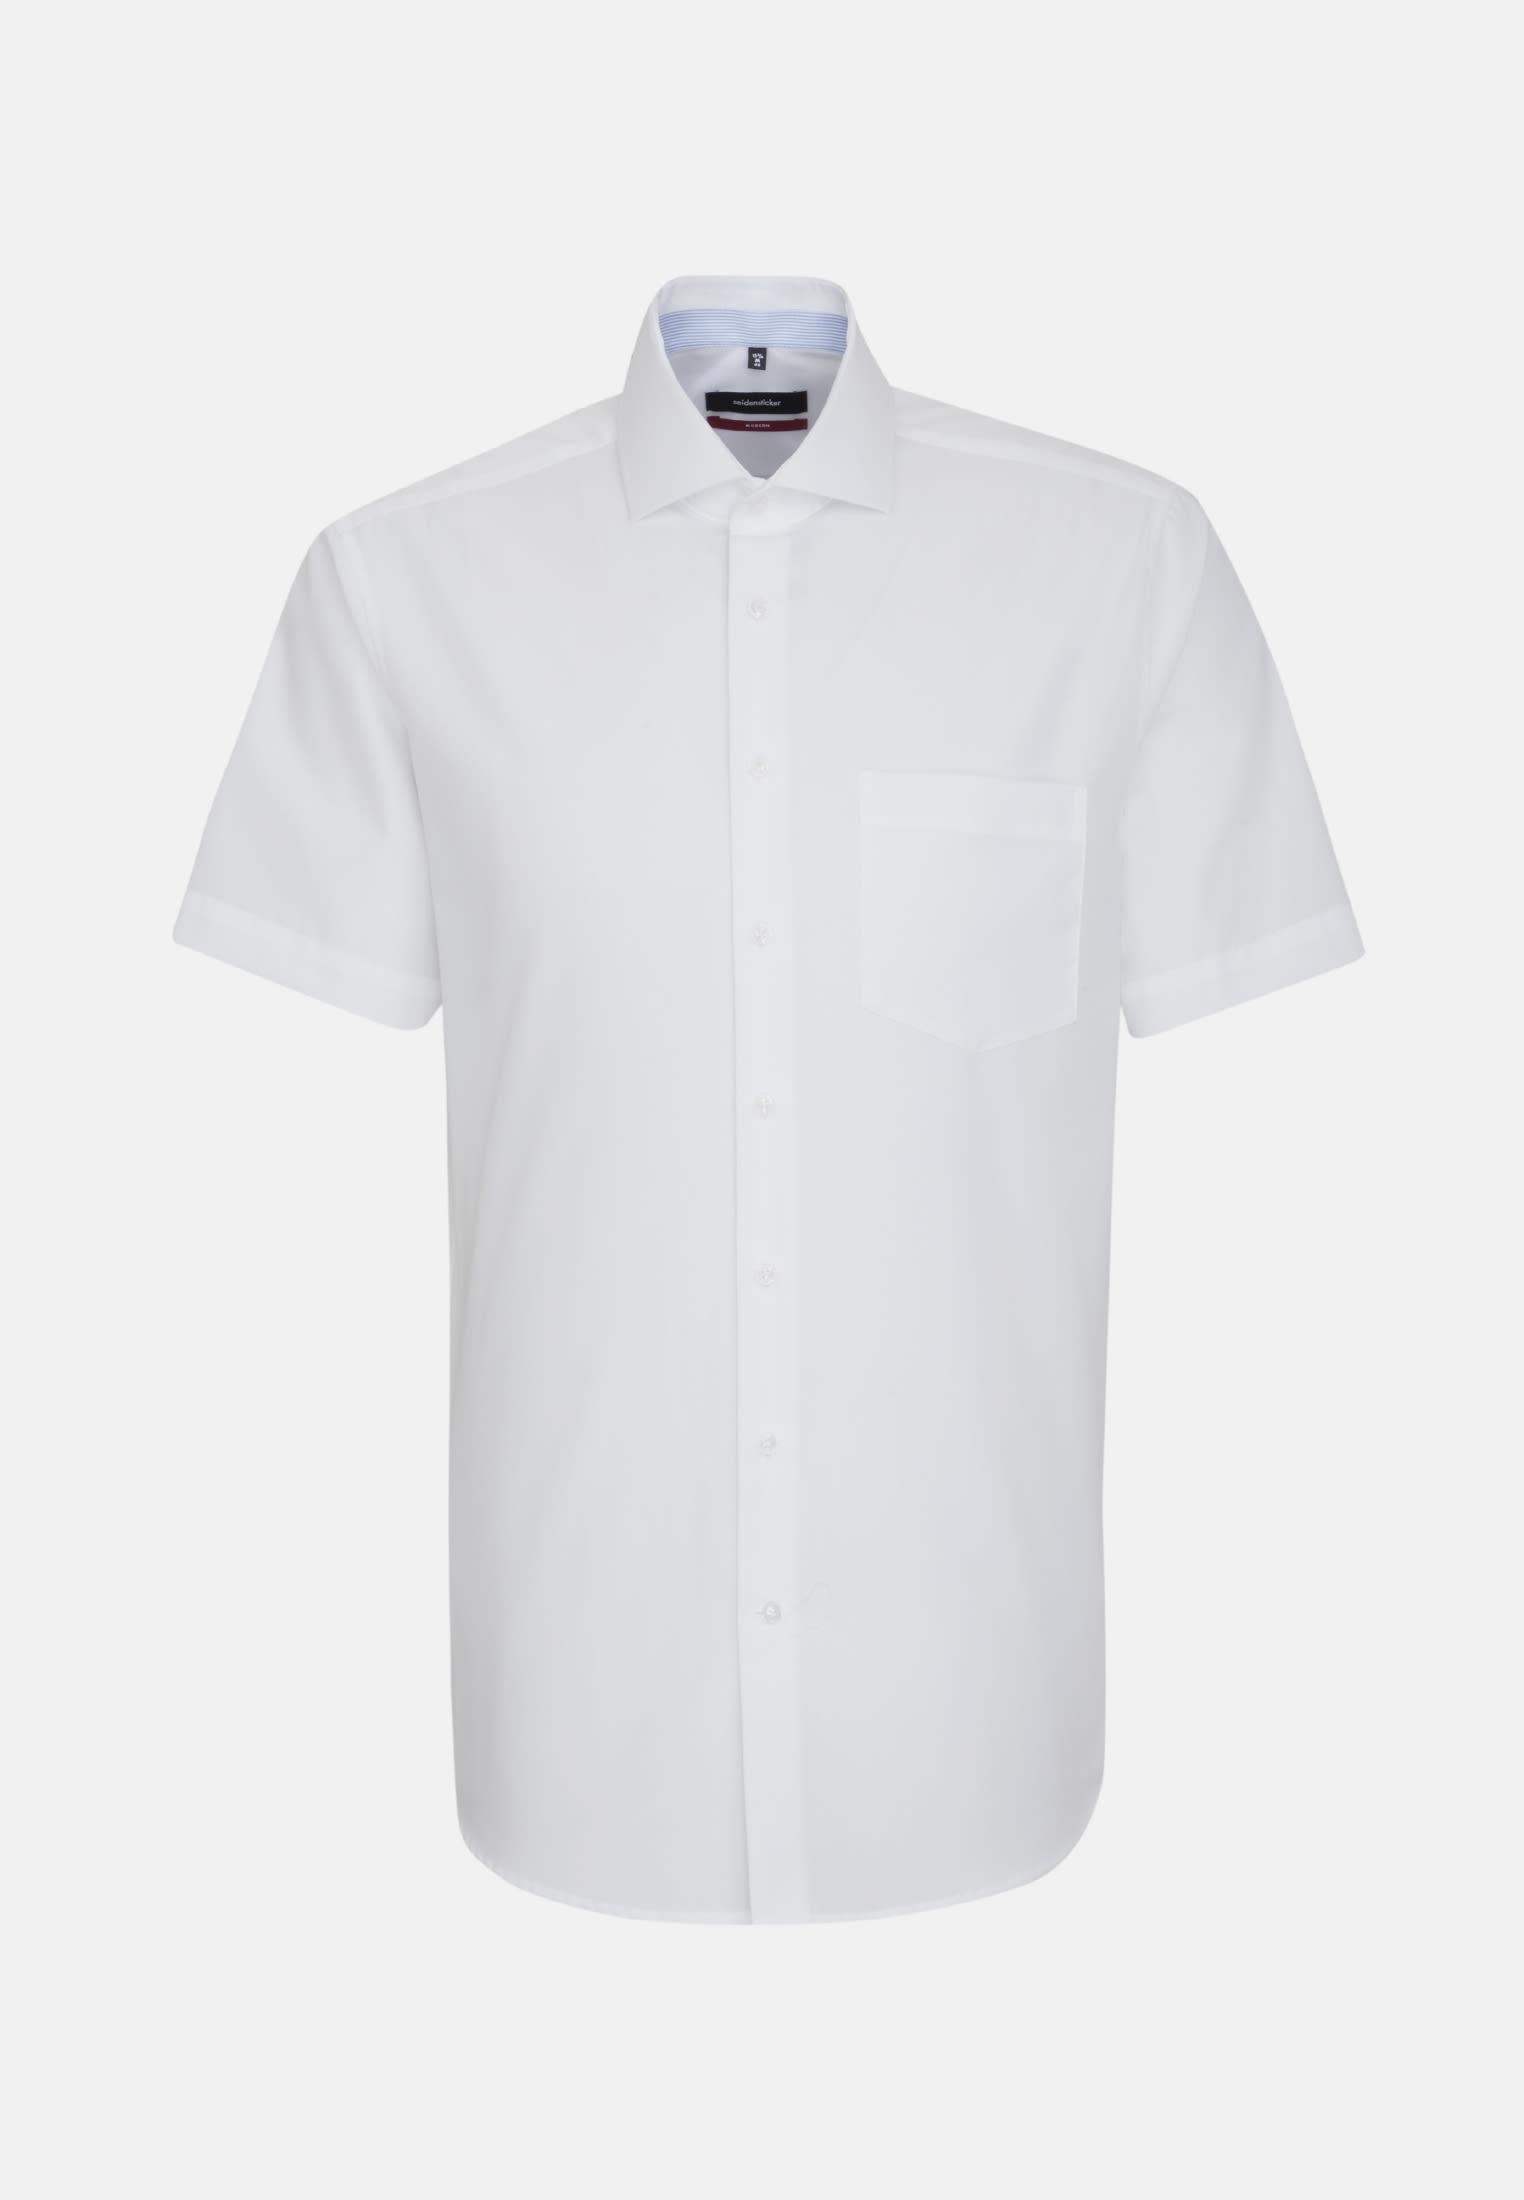 Non-iron Chambray Short arm Business Shirt in Modern with Kent-Collar in weiß |  Seidensticker Onlineshop